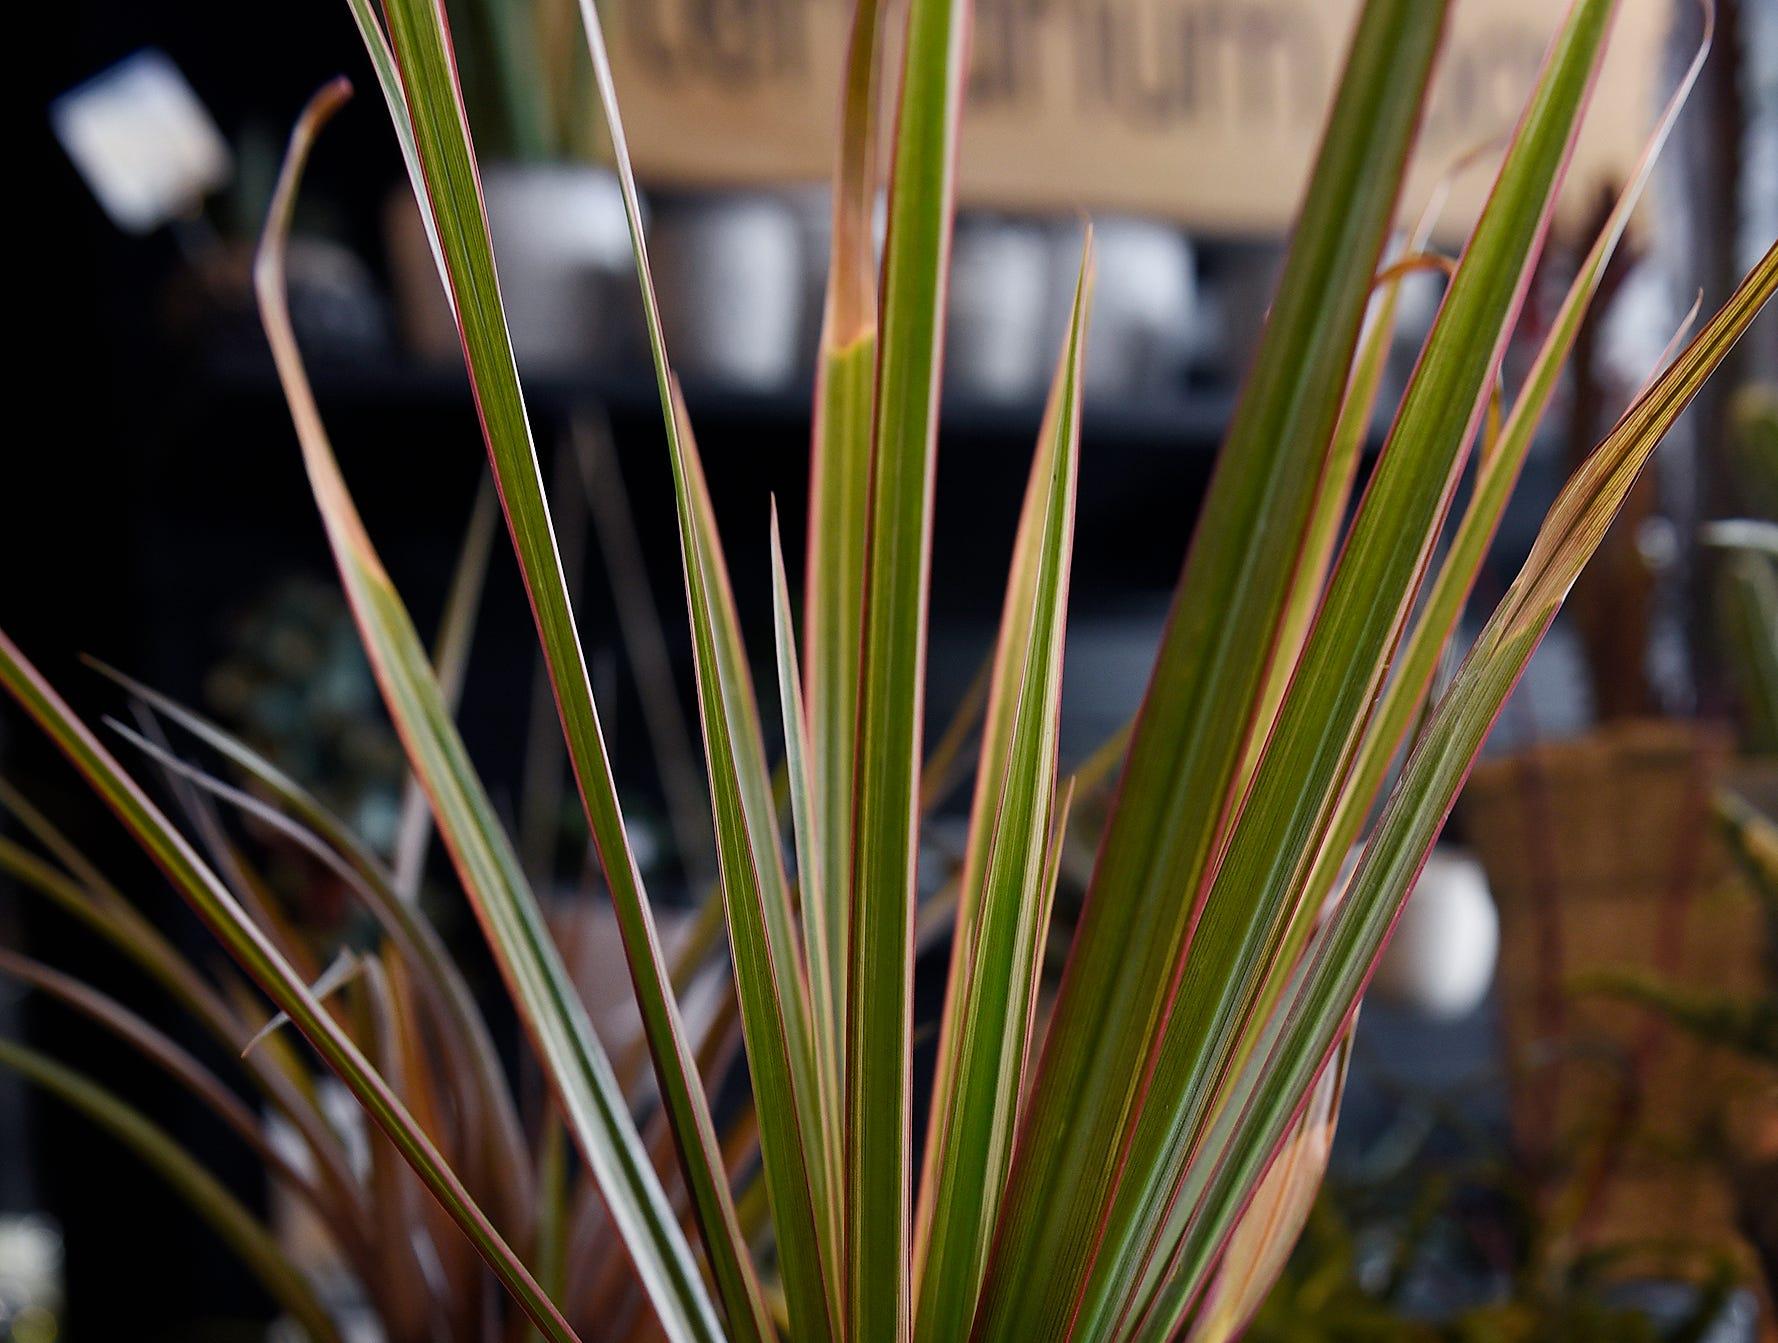 A head planter by Detroit ceramicist Cheryl English of Black Cat Pottery.